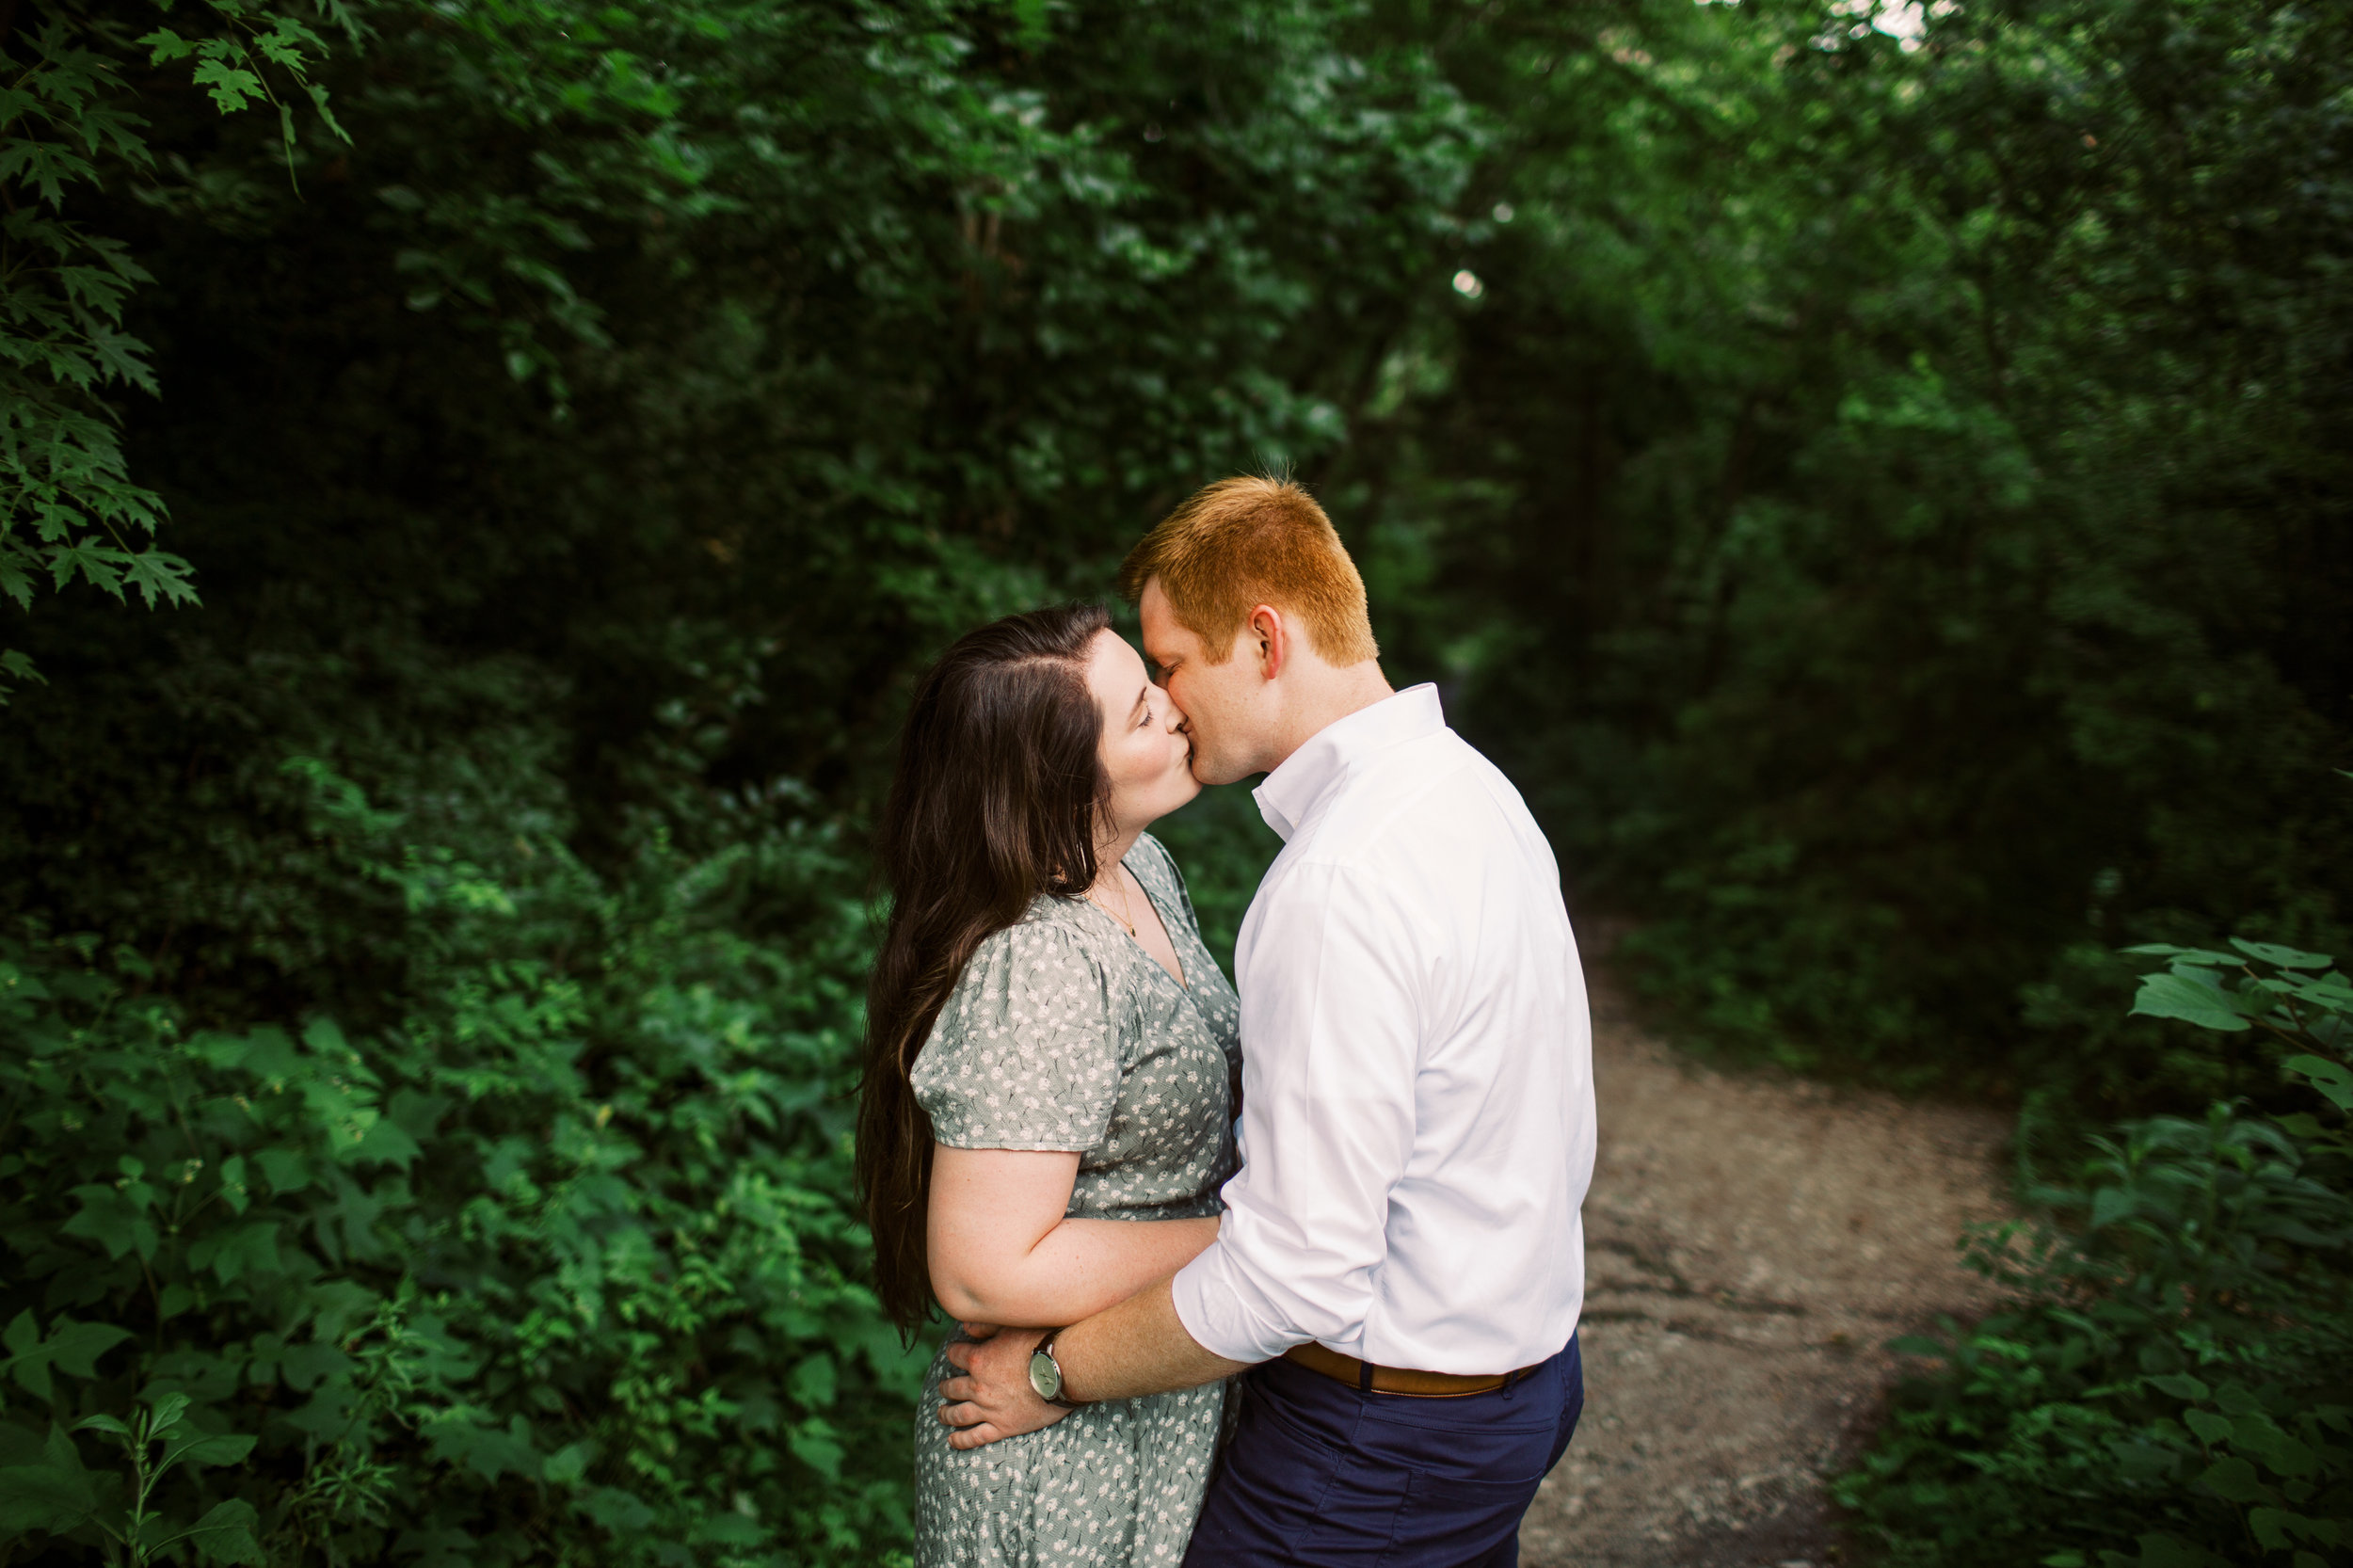 Sara_Tony_Egagement_Knoxville_Abigail_Malone_Photography-46.jpg